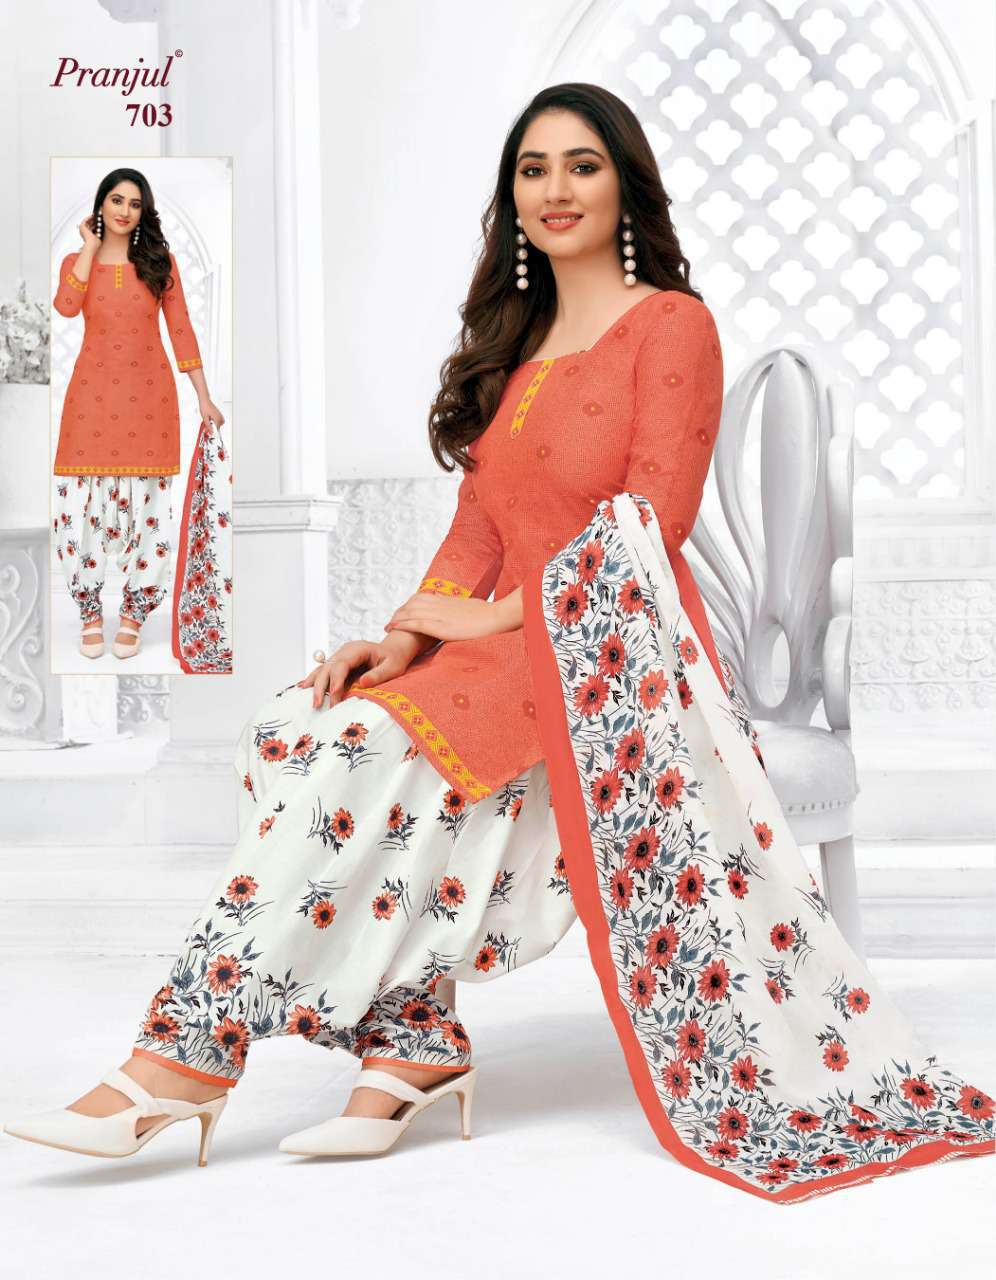 Pranjul Priyanka Vol 7 A Readymade Suit Wholesale Catalog 15 Pcs 2 - Pranjul Priyanka Vol 7 A Readymade Suit Wholesale Catalog 15 Pcs